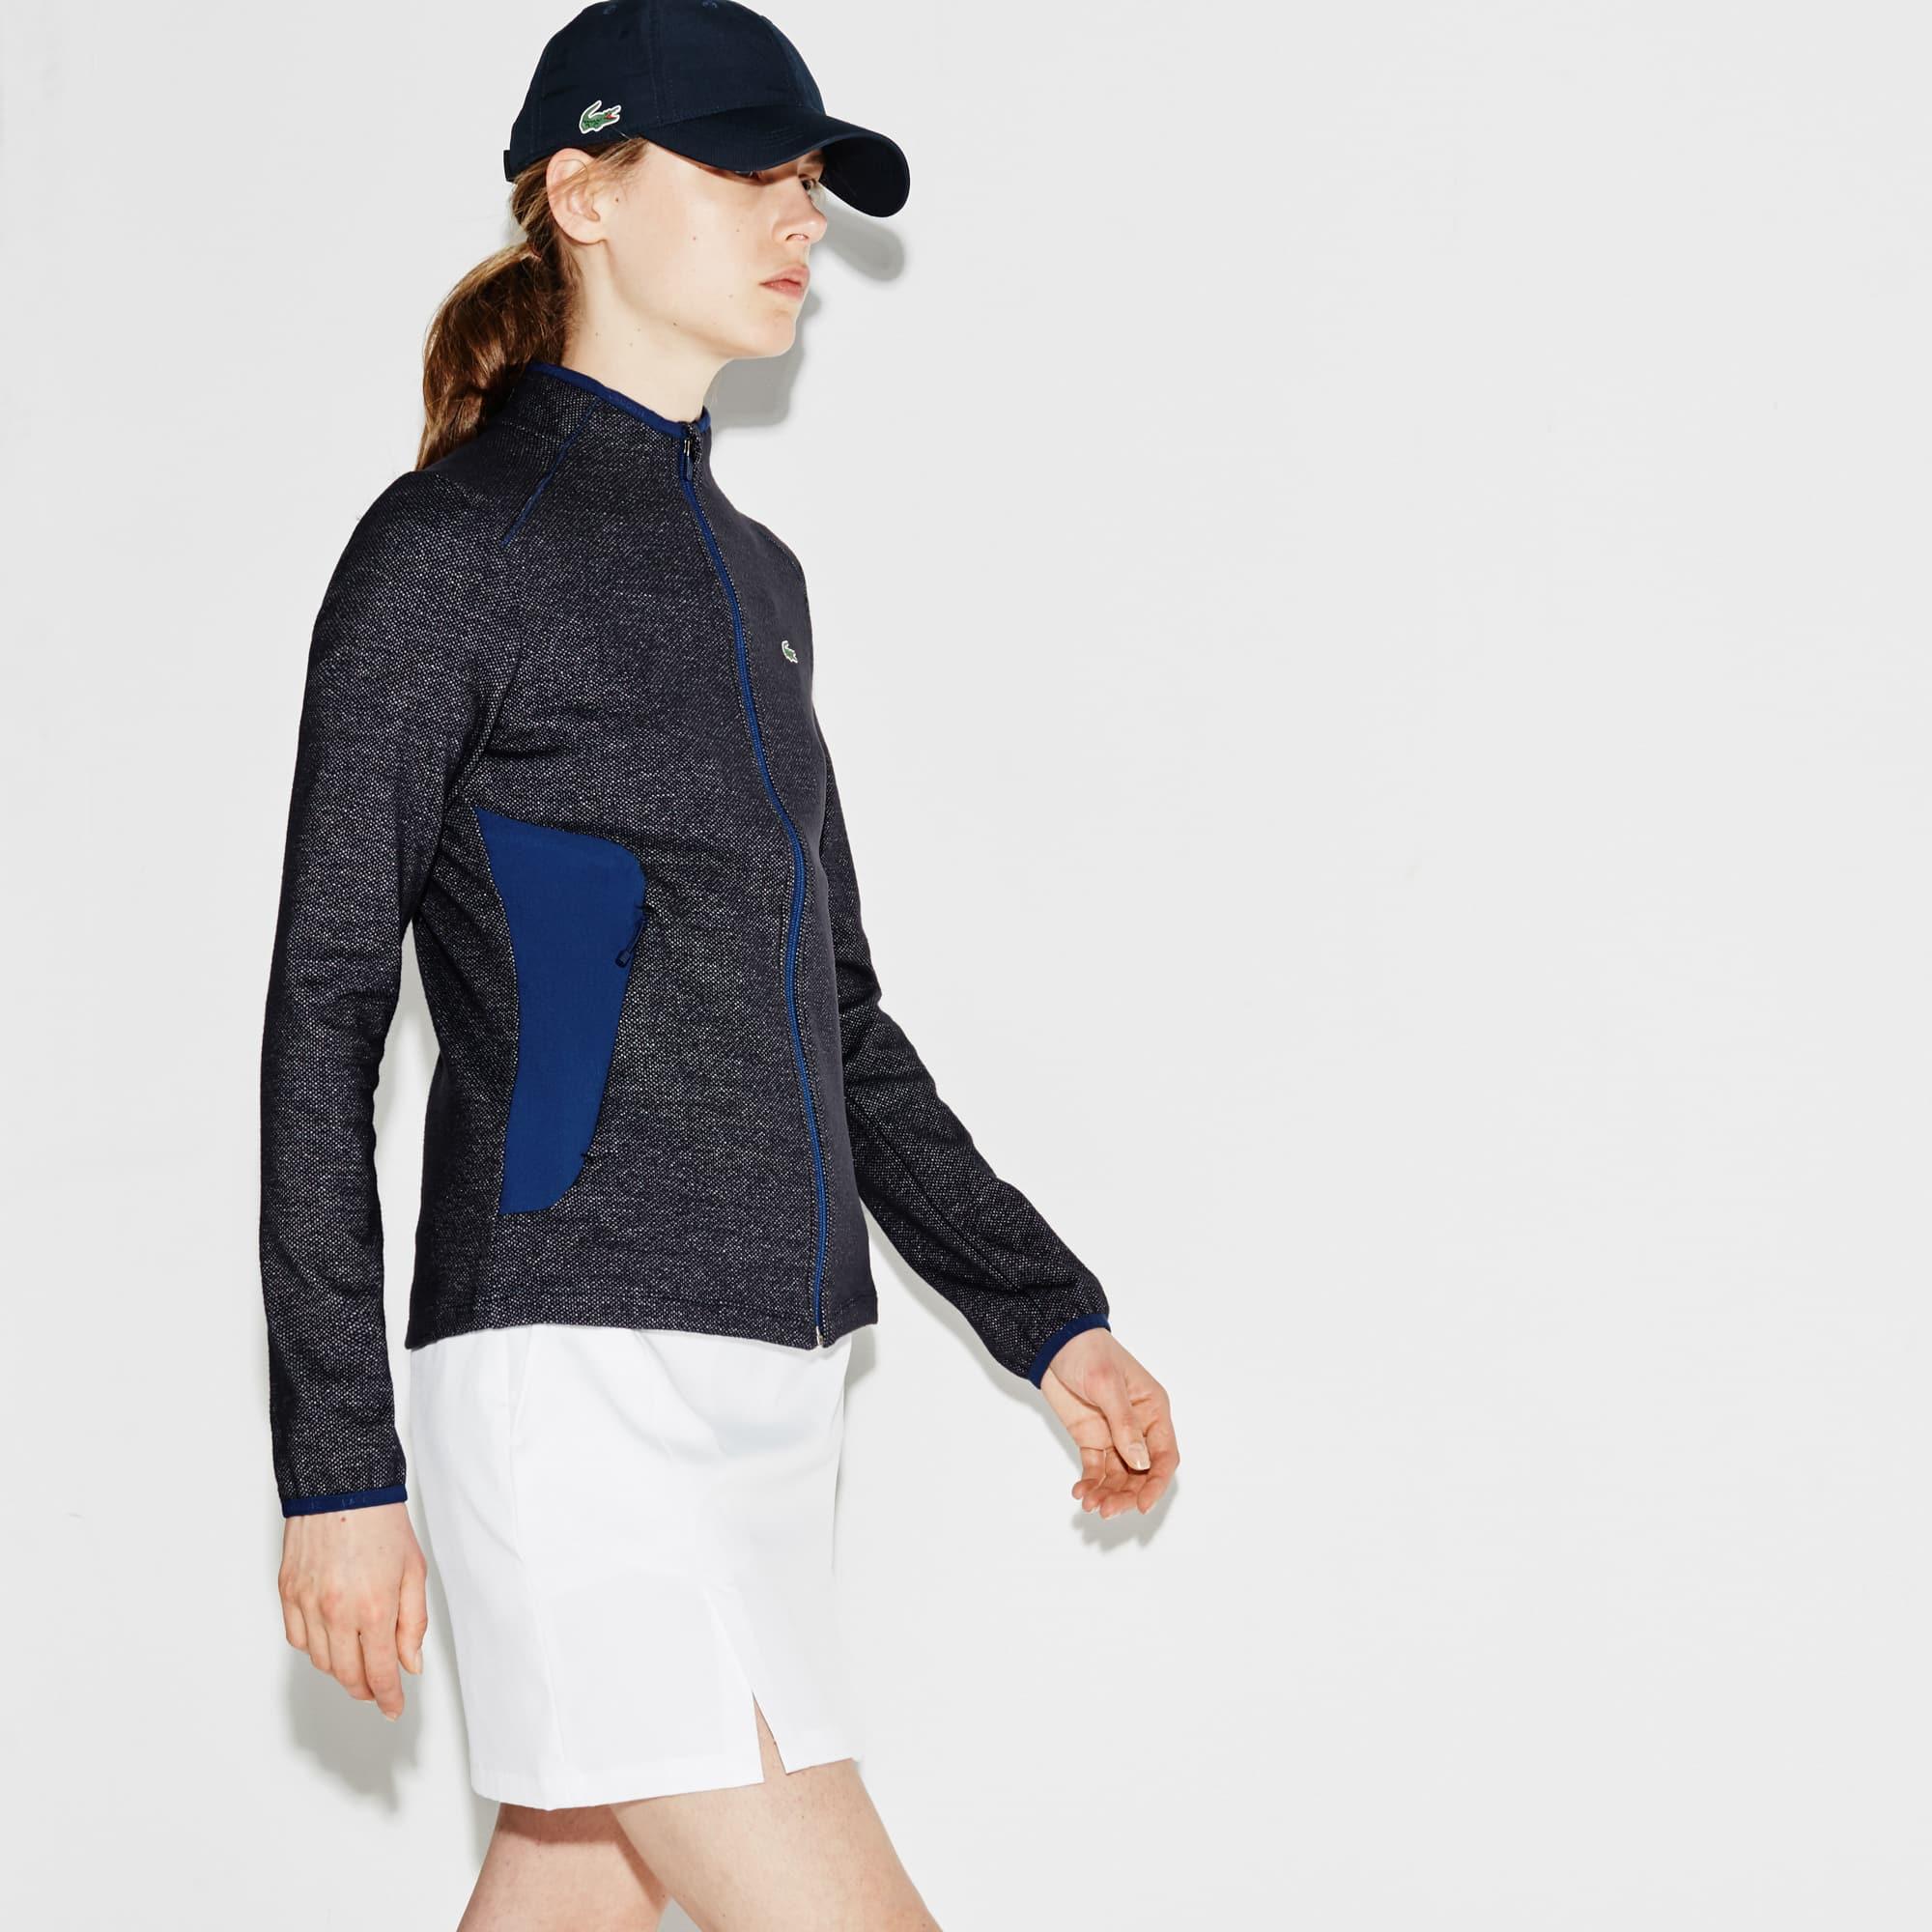 Women's  SPORT Golf Stretch Tech Midlayer Zip Sweatshirt